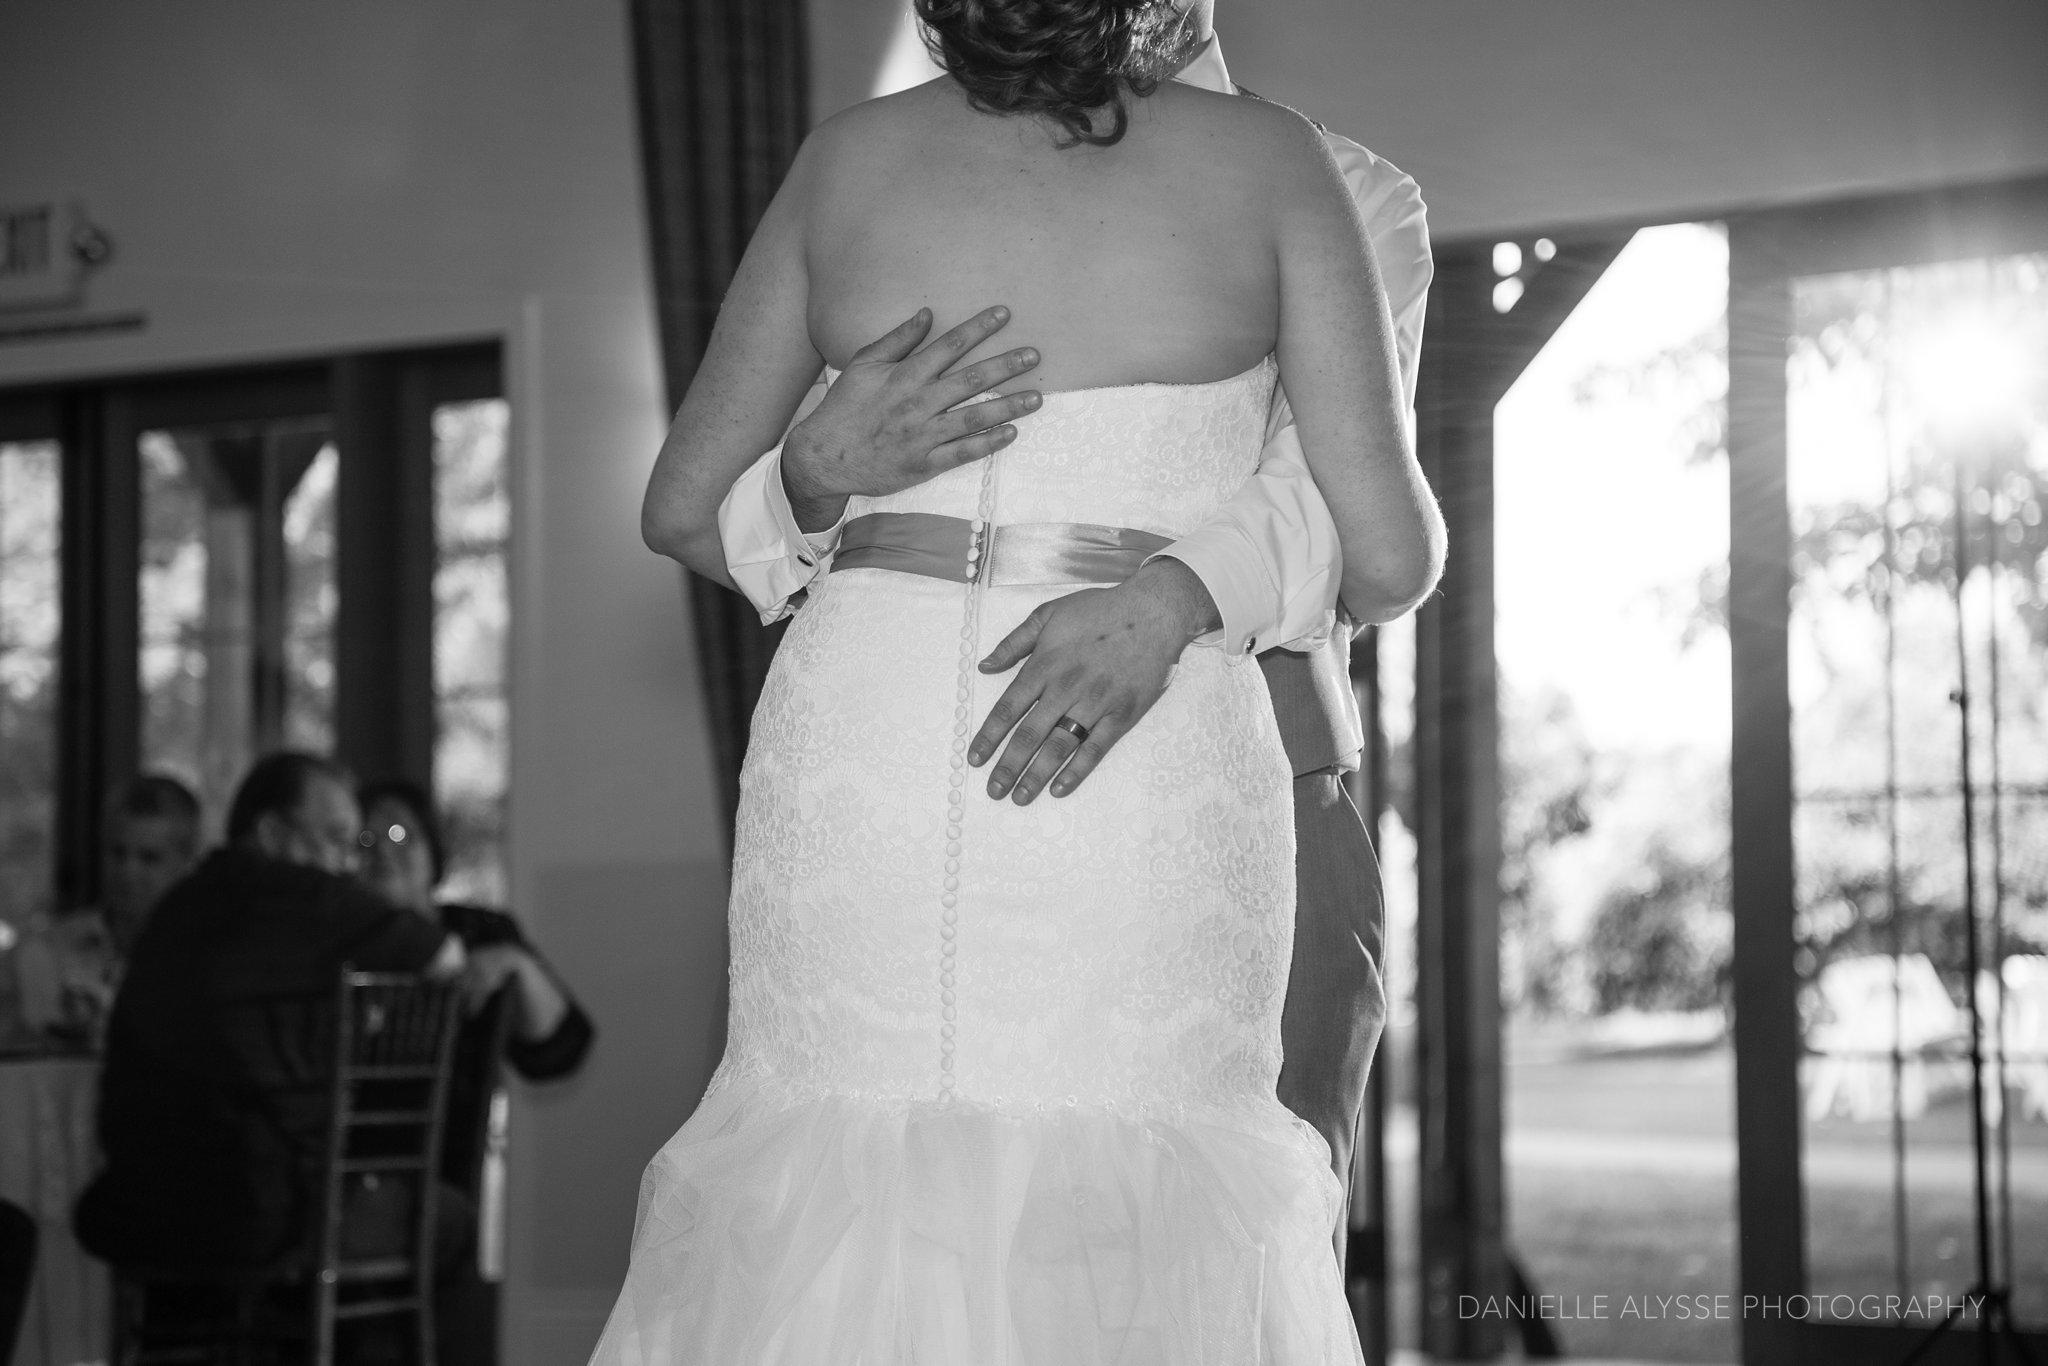 170507_blog_megan_david_wedding_loomis_flower_farm_inn_danielle_alysse_photography_sacramento_photographer0460_WEB.jpg